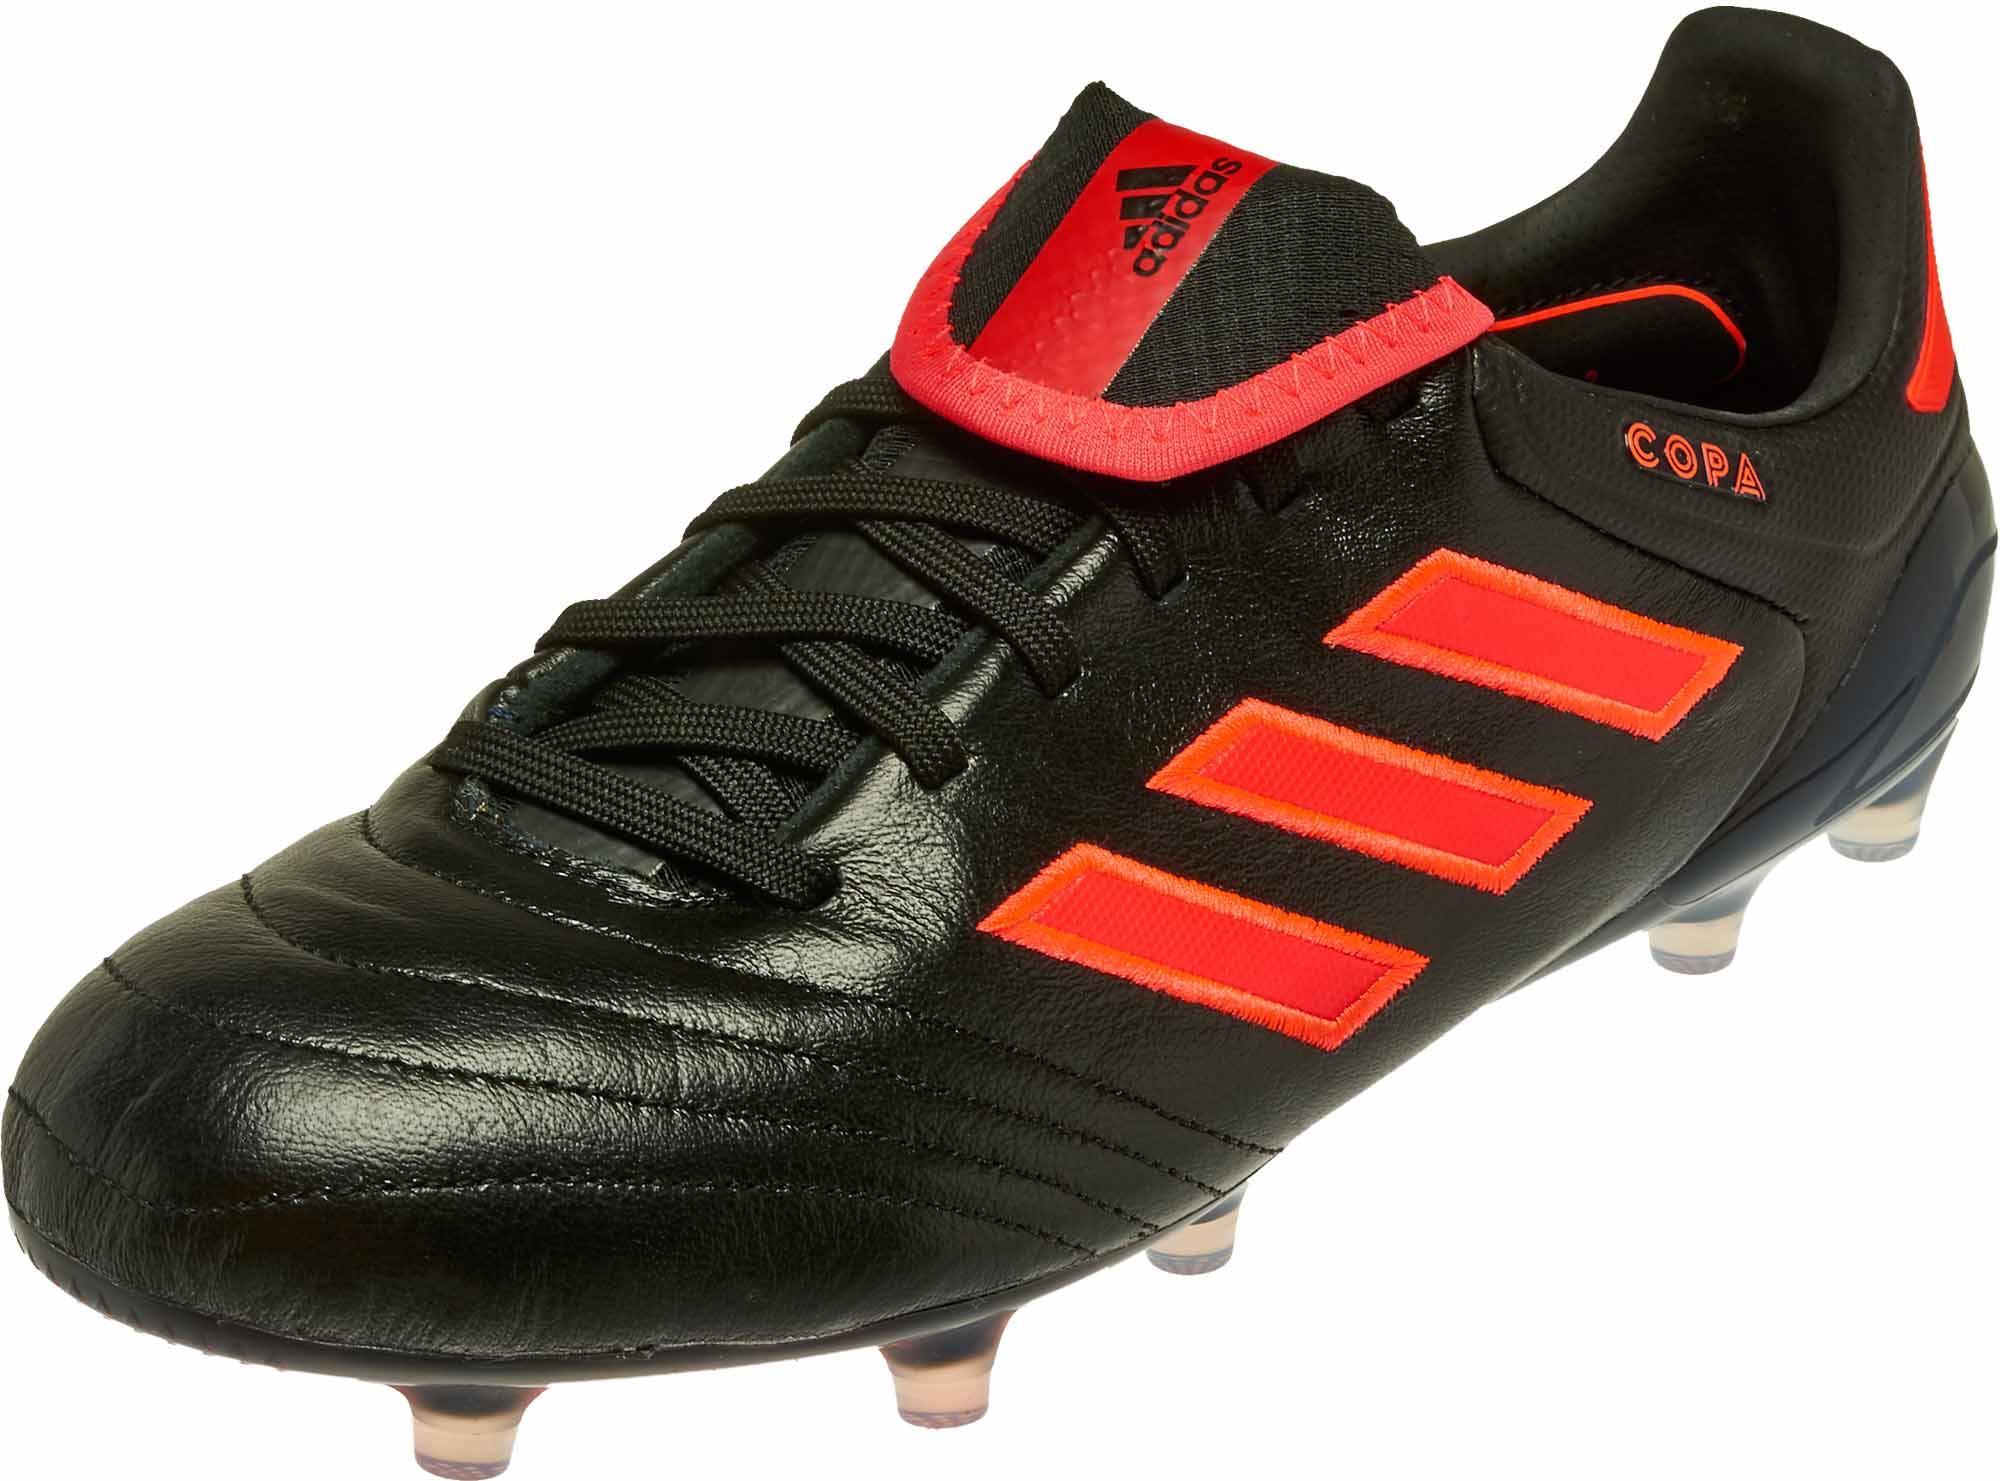 adidas Copa 17.1 FG - Black Copa Soccer Cleats cb8395b27